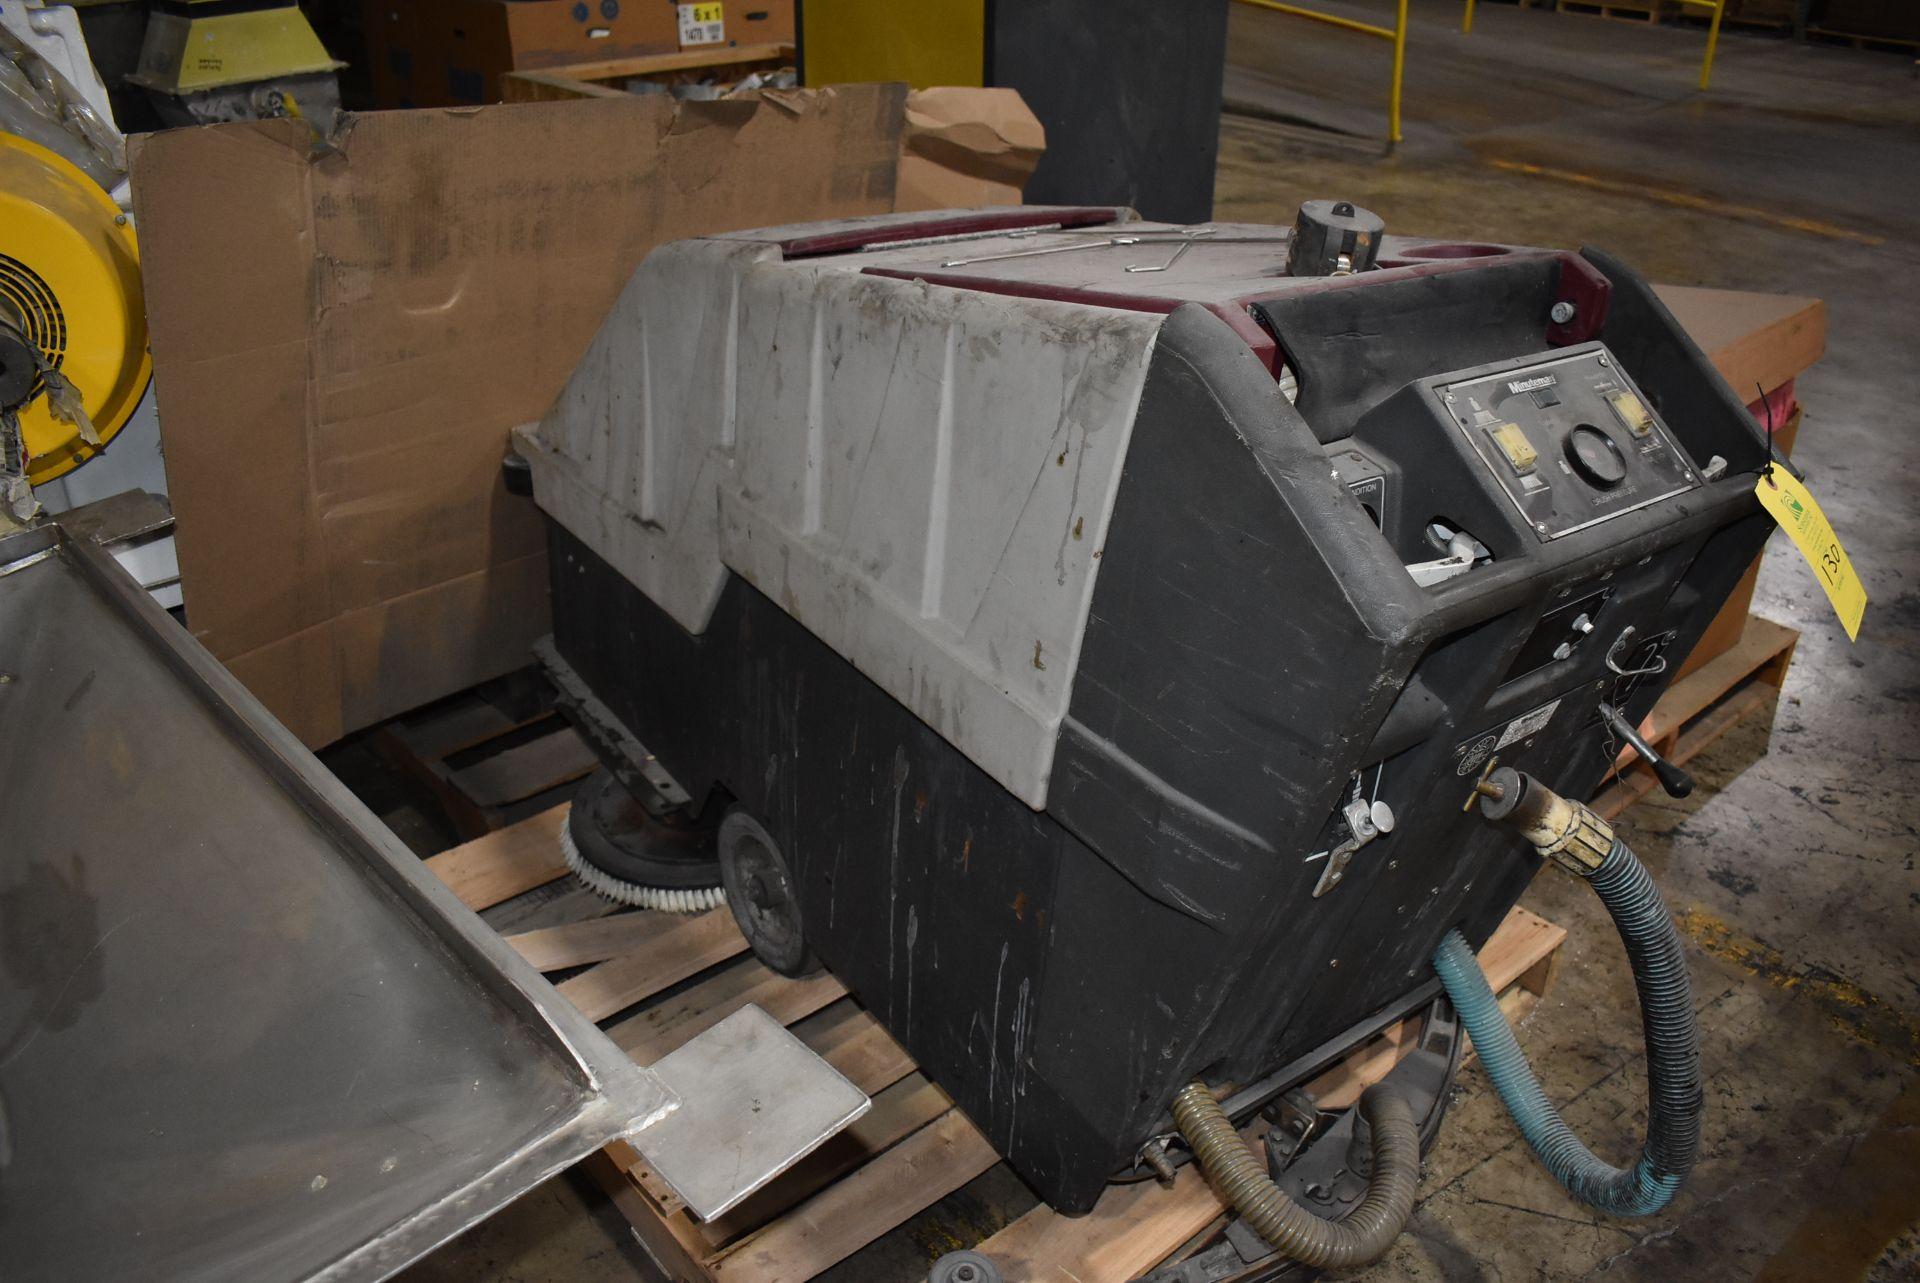 Minuteman Model #MG32036QP Electric Floor Scrubber - Image 3 of 3